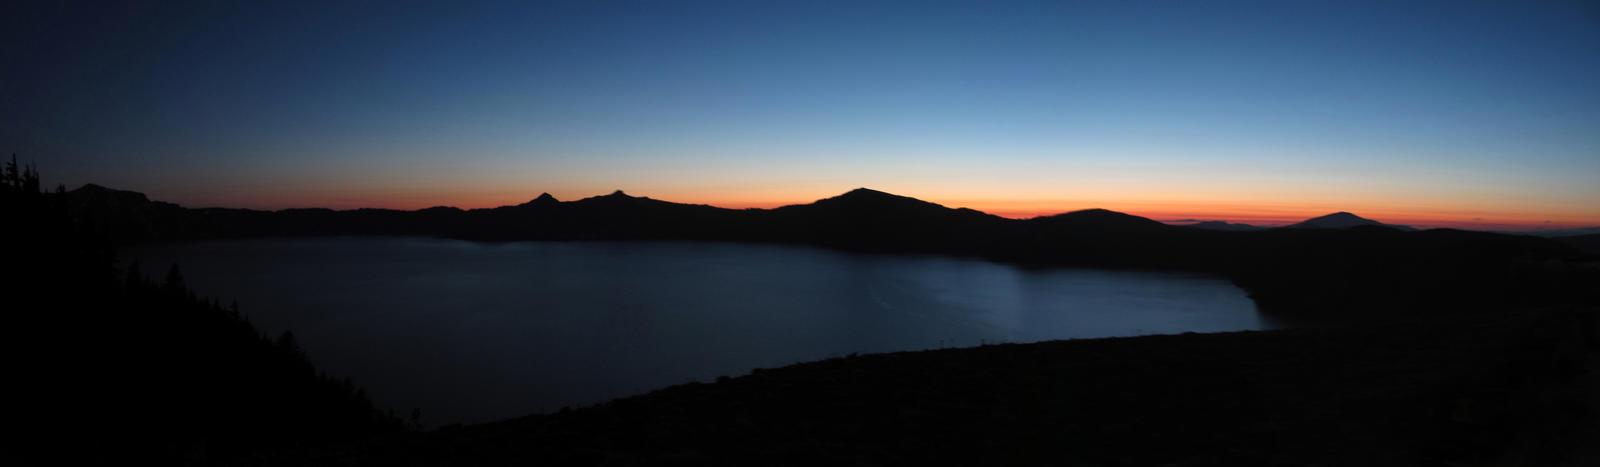 Crater lake 2 7-22-12